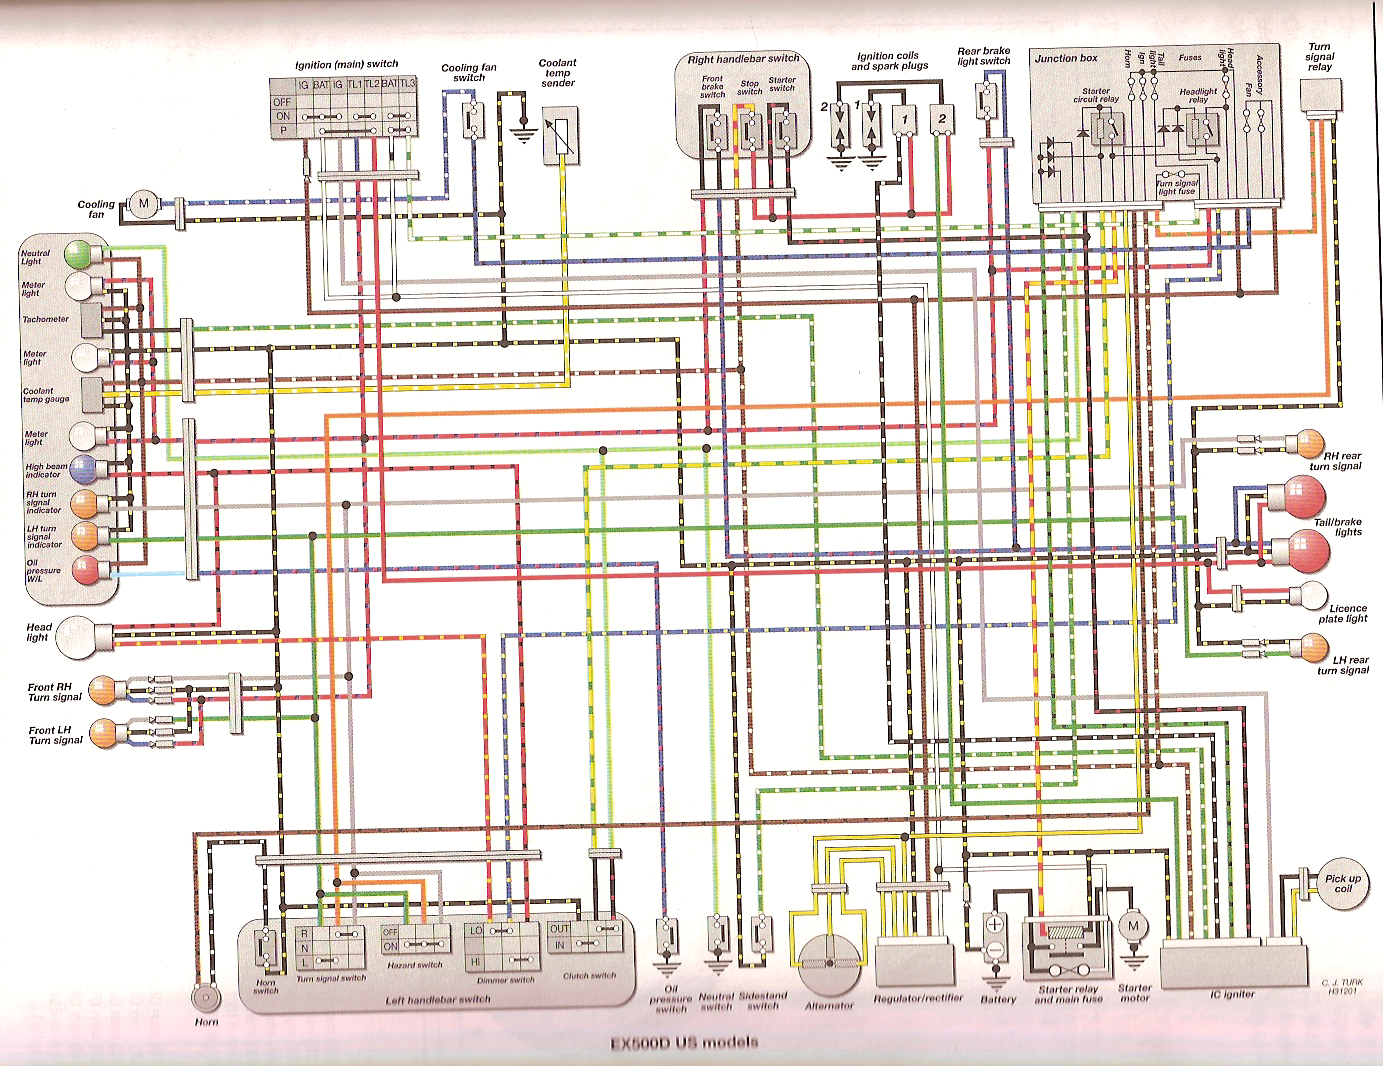 ninja_wiring_diagram  Pin Cdi Wiring Diagram Suzuki on round trailer plug, xlr connector, horn relay, relay compressor, flat trailer plug, relay socket, flat trailer, led switch,